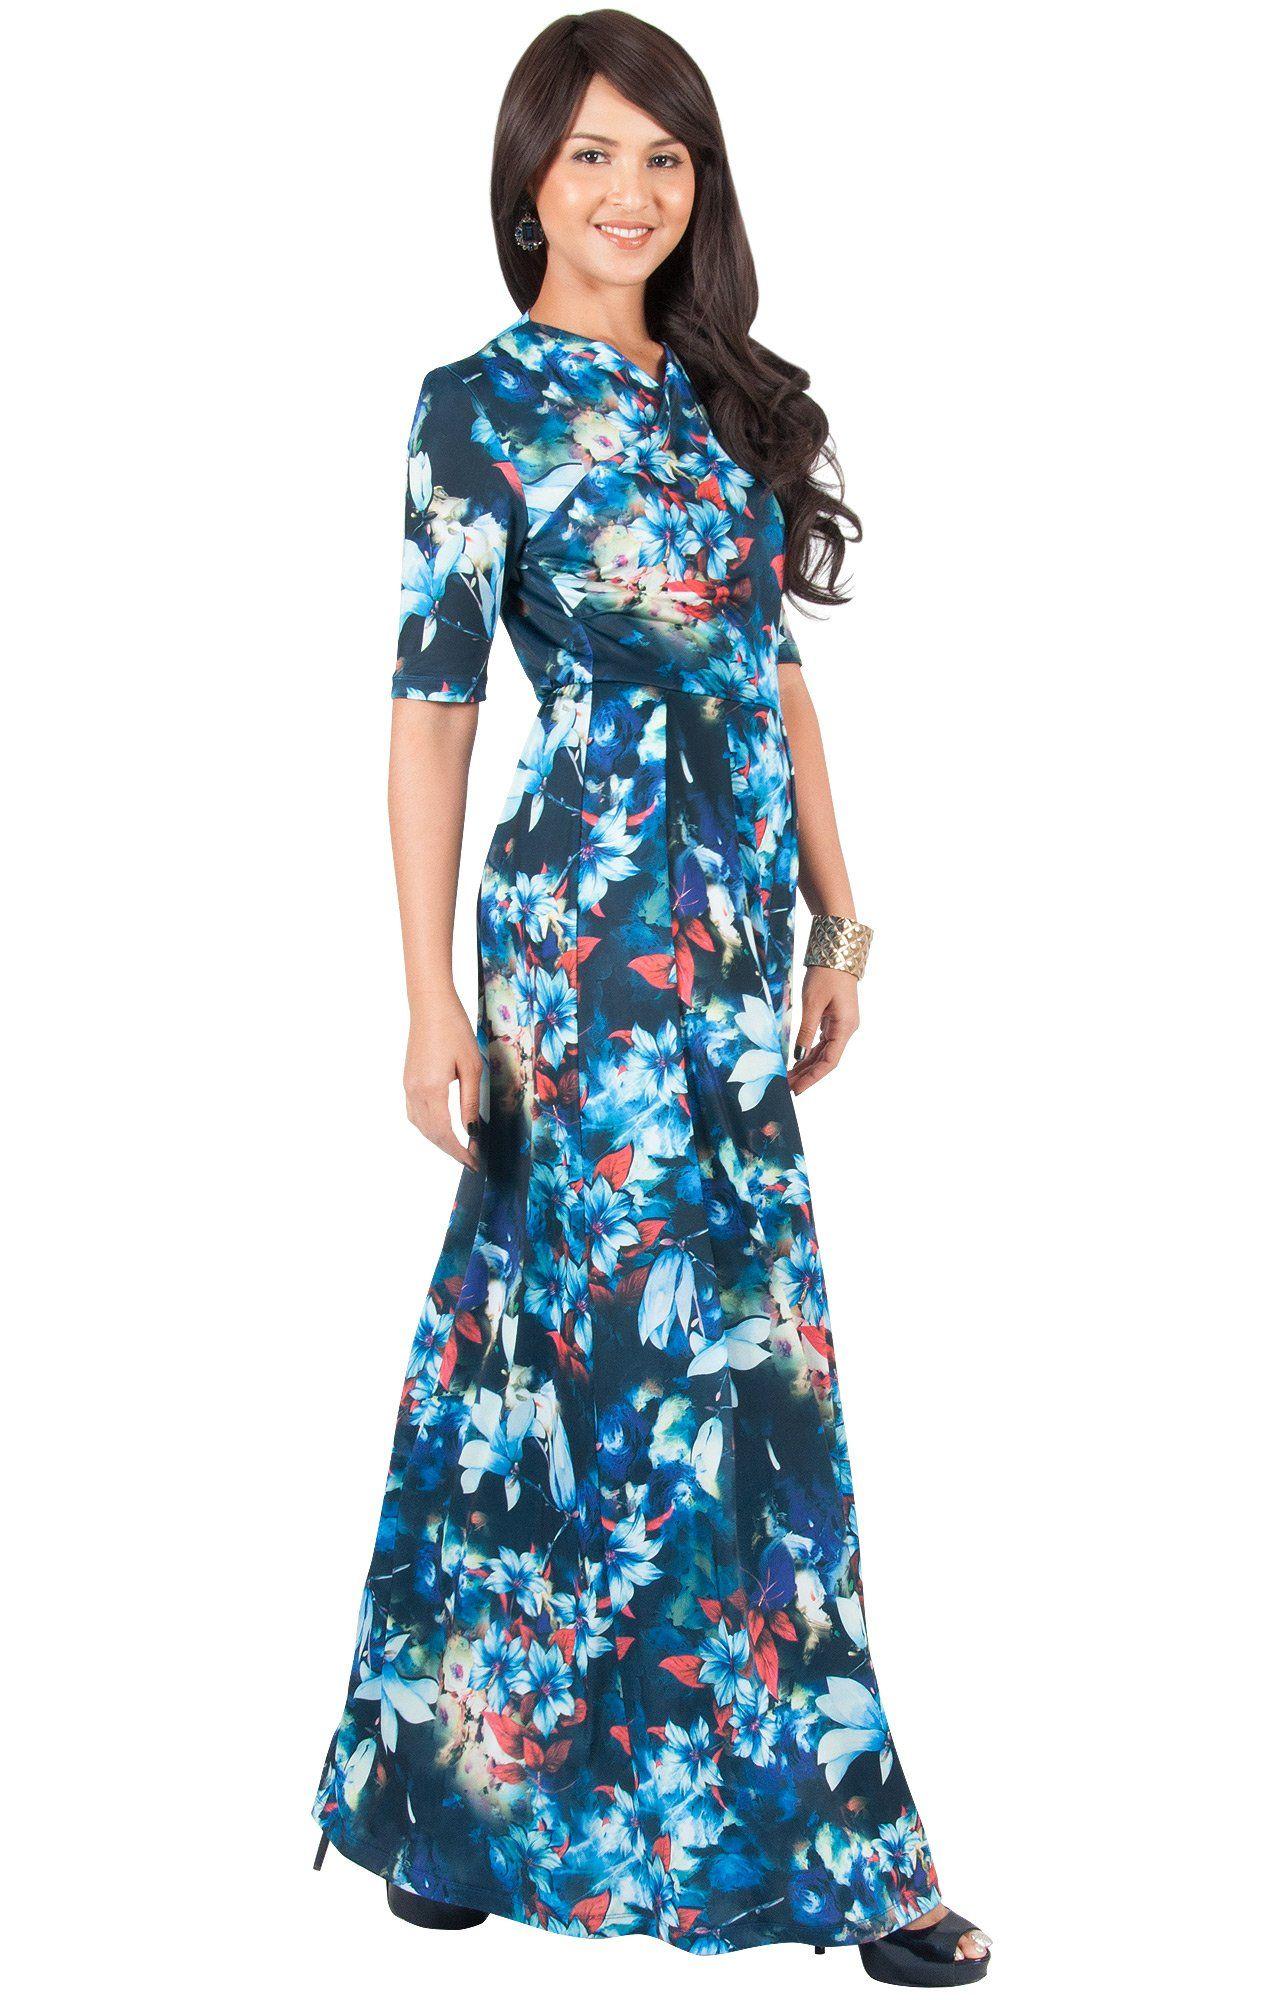 827b7ecb974f Maternity Outfits - beautiful maternity dresses   KOH KOH Plus Size Women  Long Flowy Summer Short